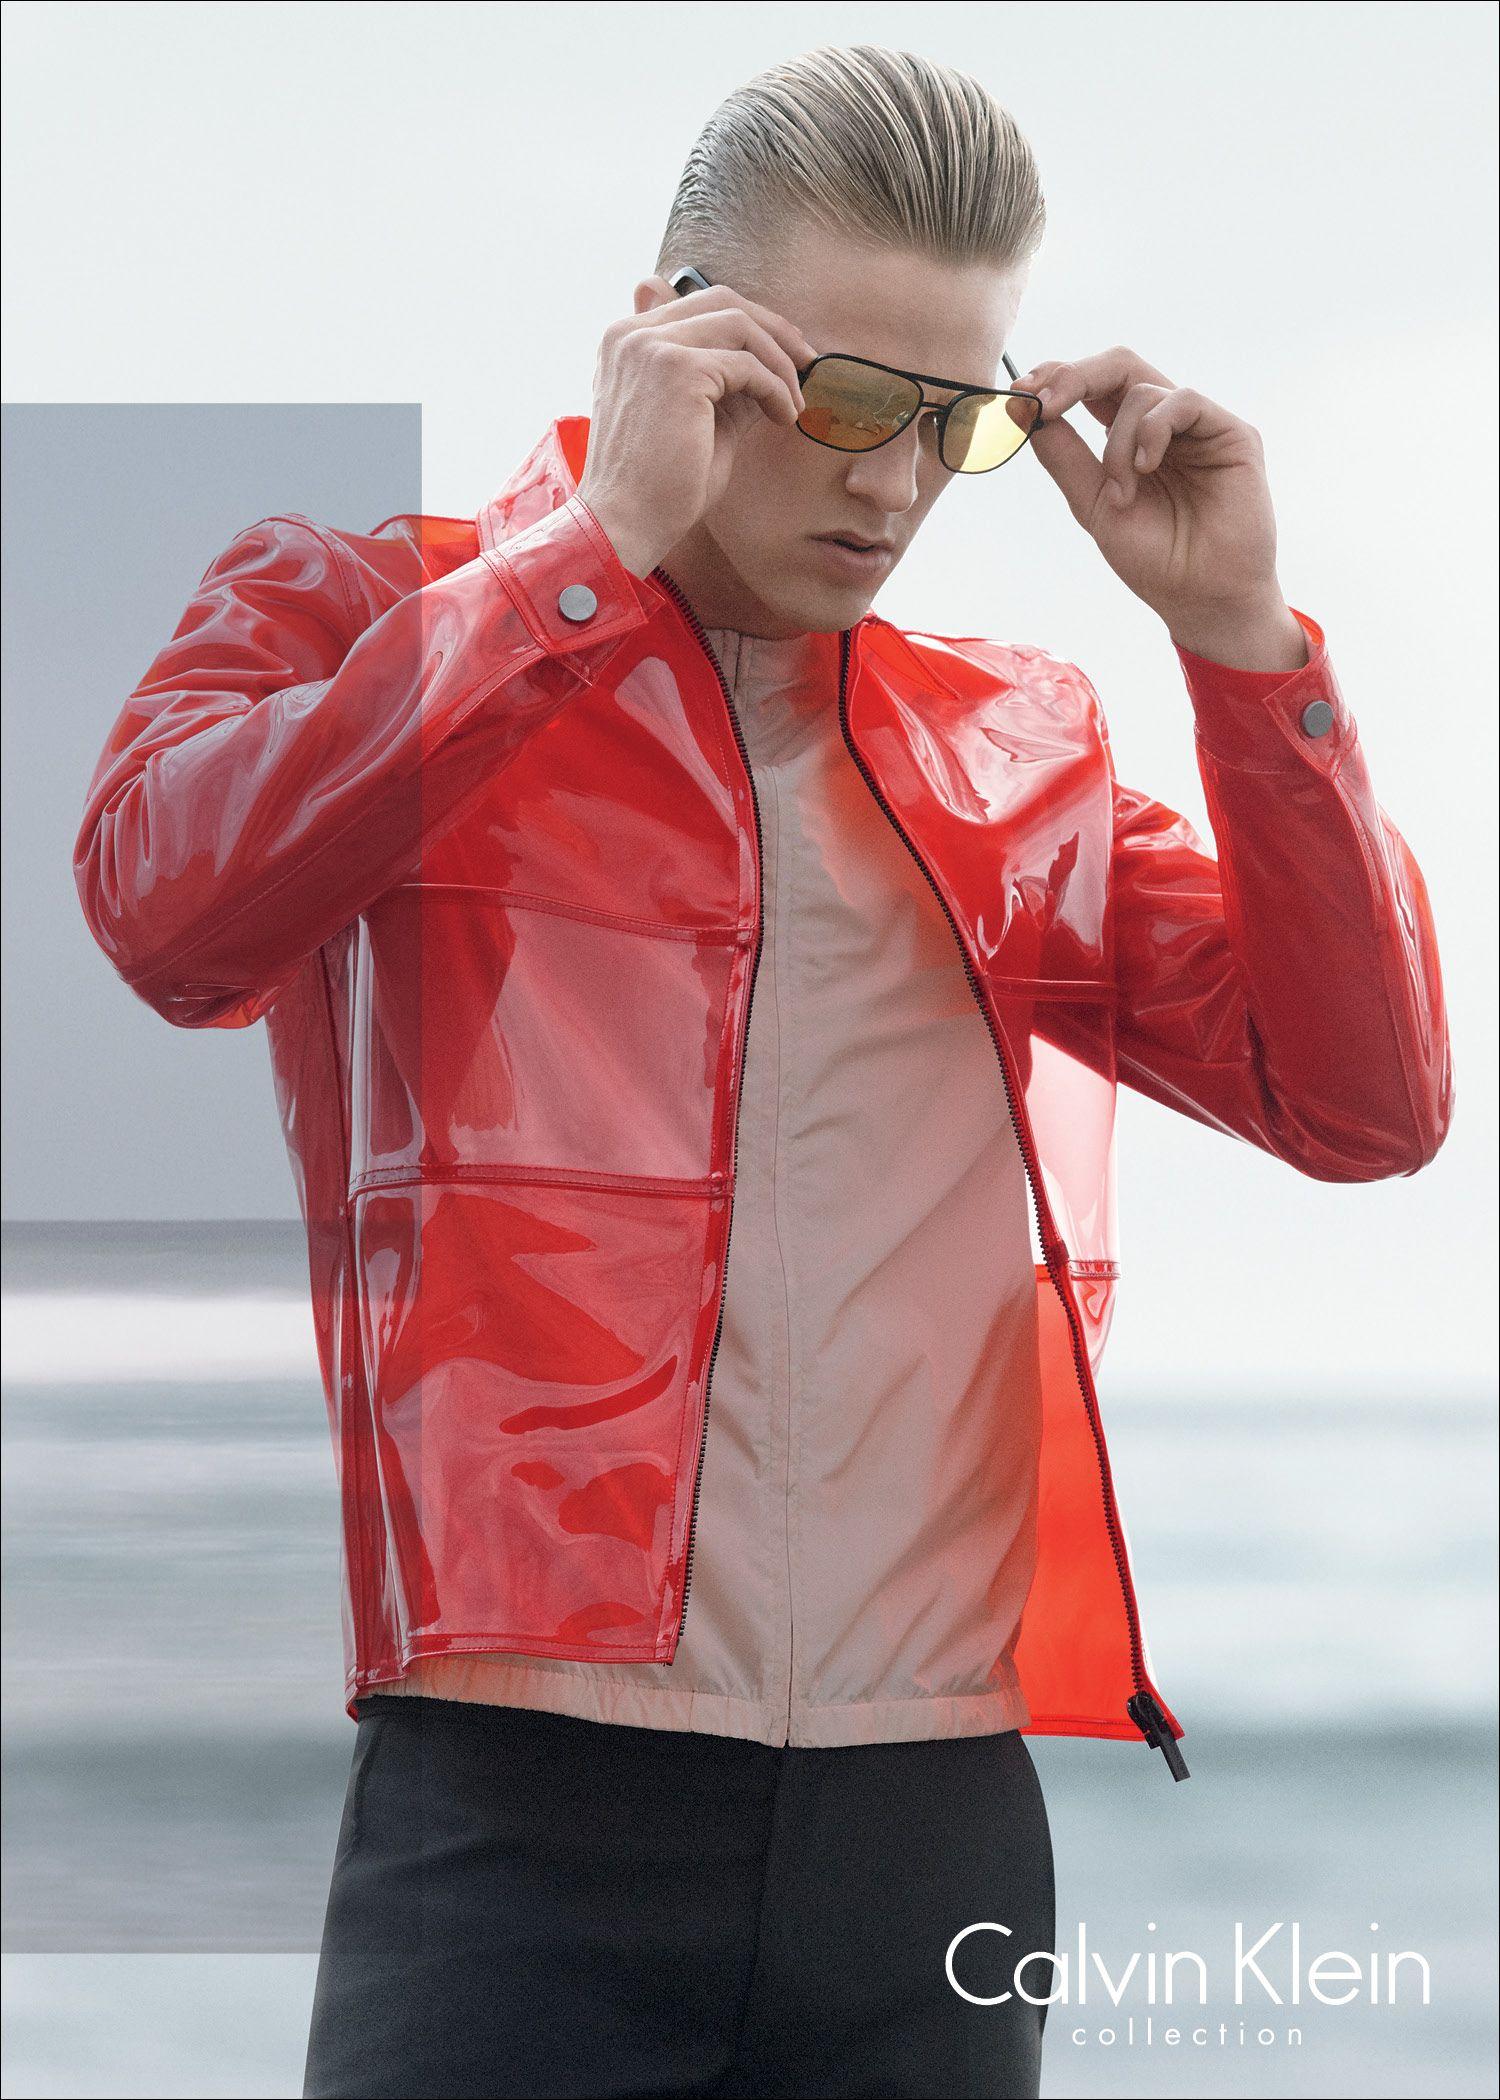 Calvin klein leather jacket 2015